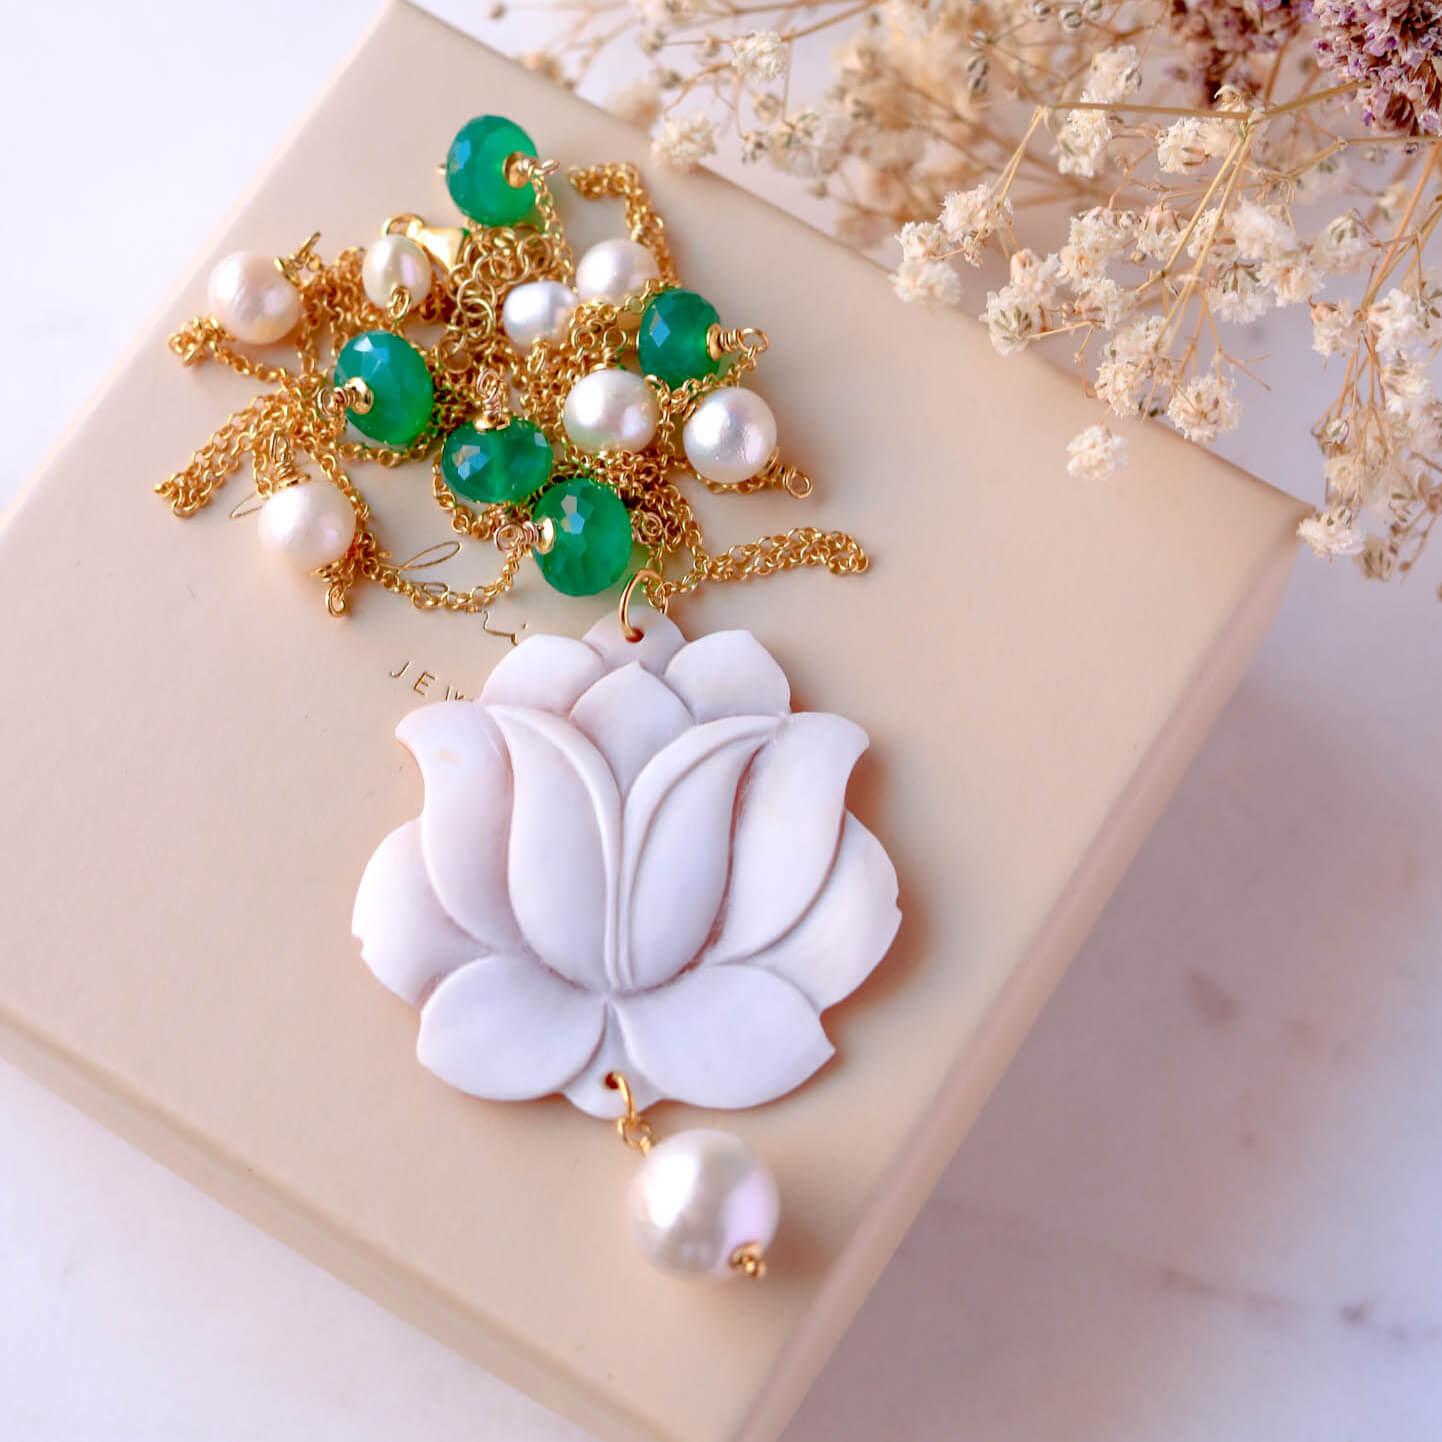 Melania Gorini Jewelry emporio mida1